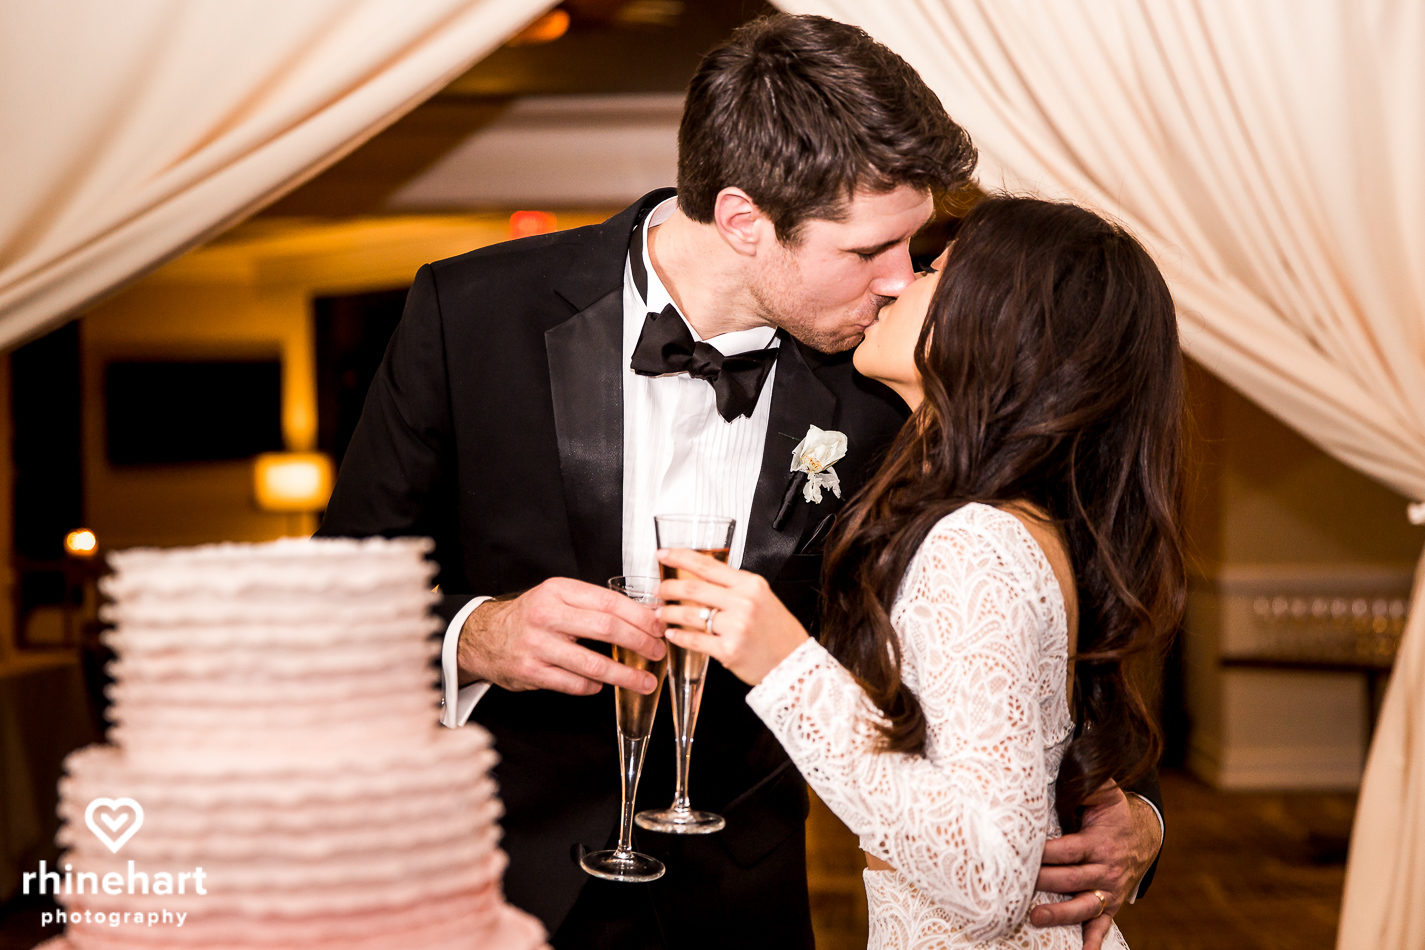 four-seasons-dc-wedding-photographers-best-photos-35